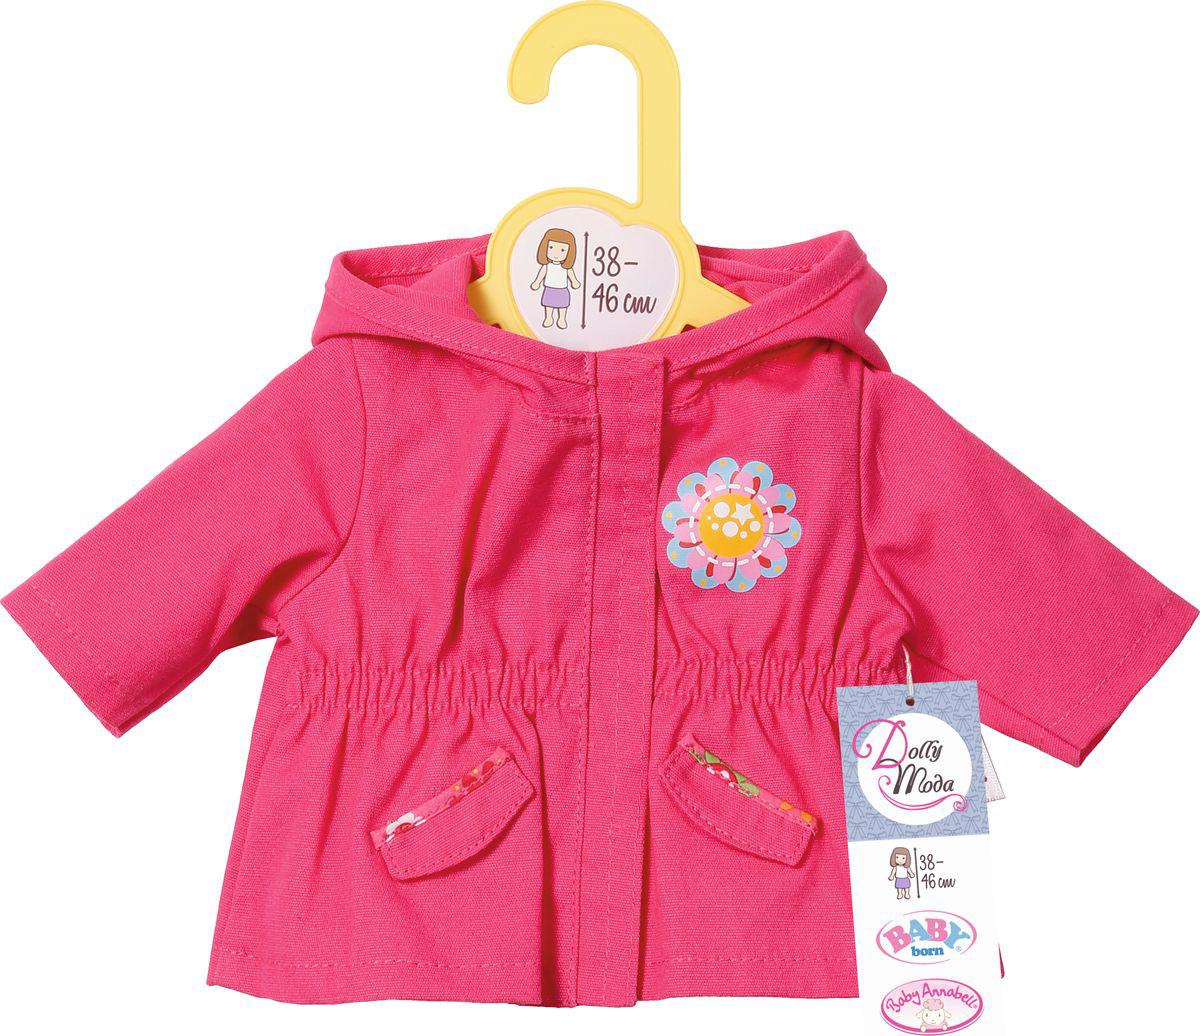 Zapf Creation Одежда для кукол Курточка цвет розовый - Куклы и аксессуары